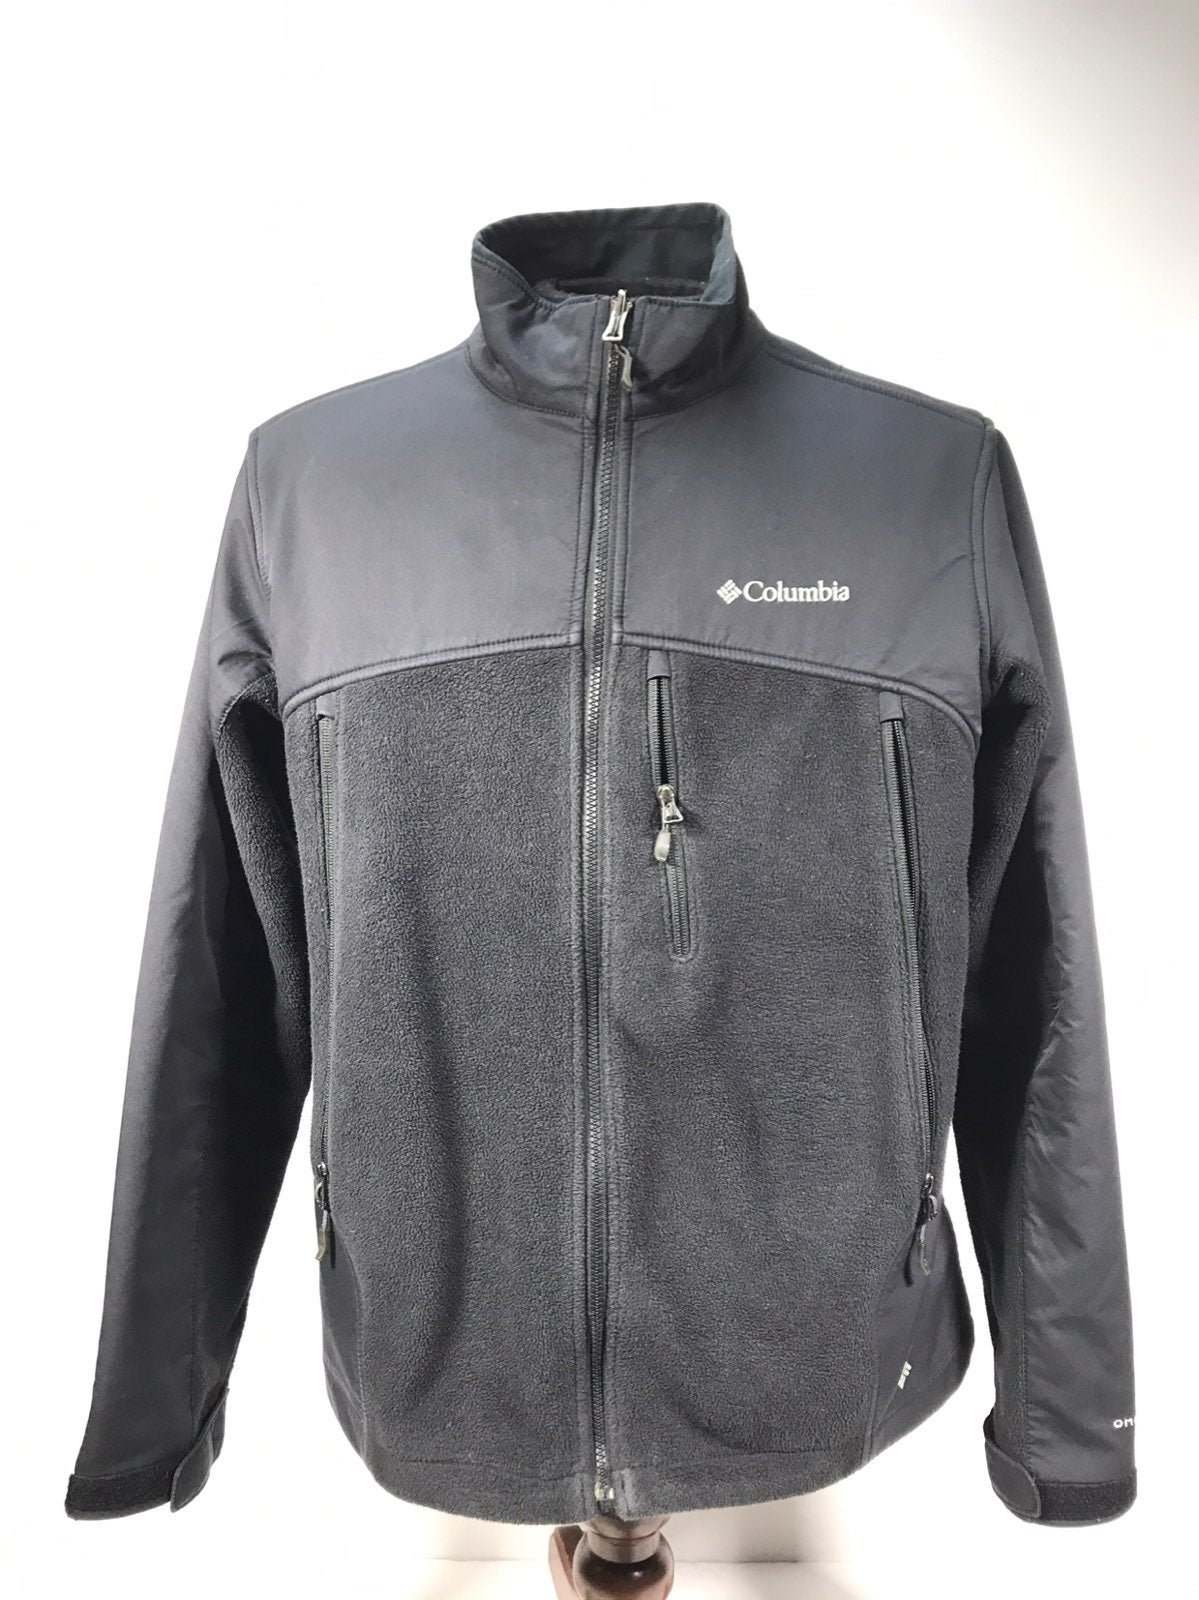 Columbia omni-heat fleece jacket mens LG